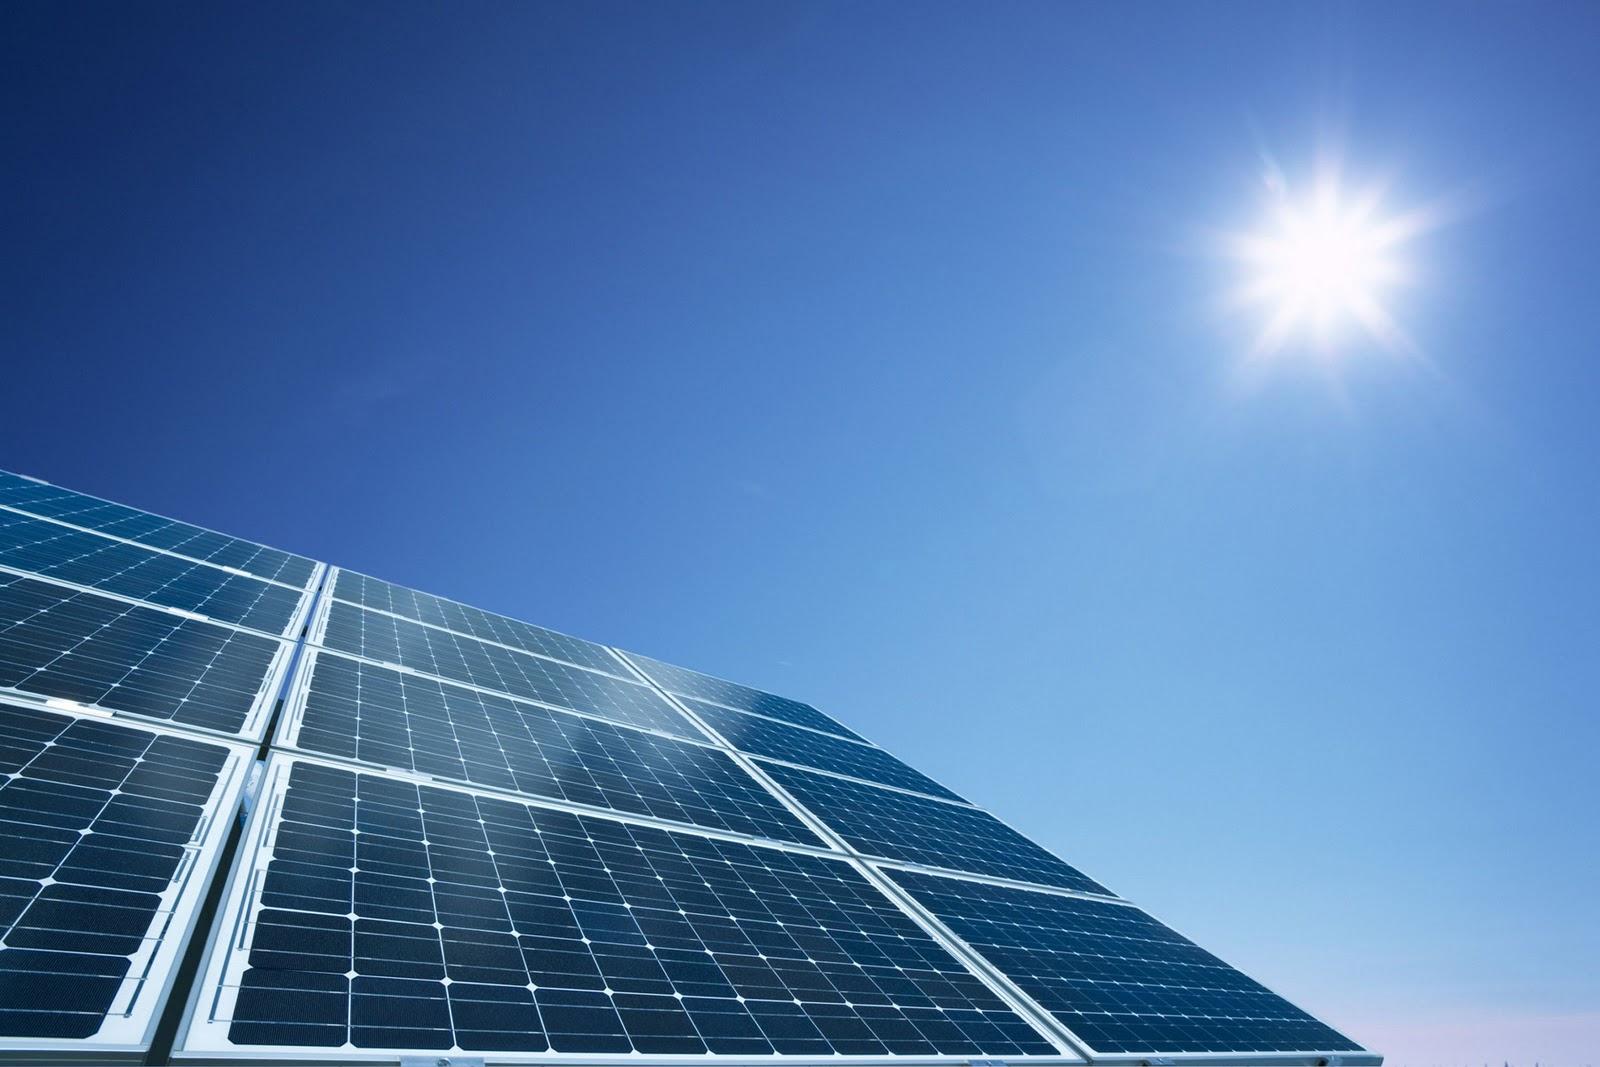 Sarawak's unduly overlooked solar potential